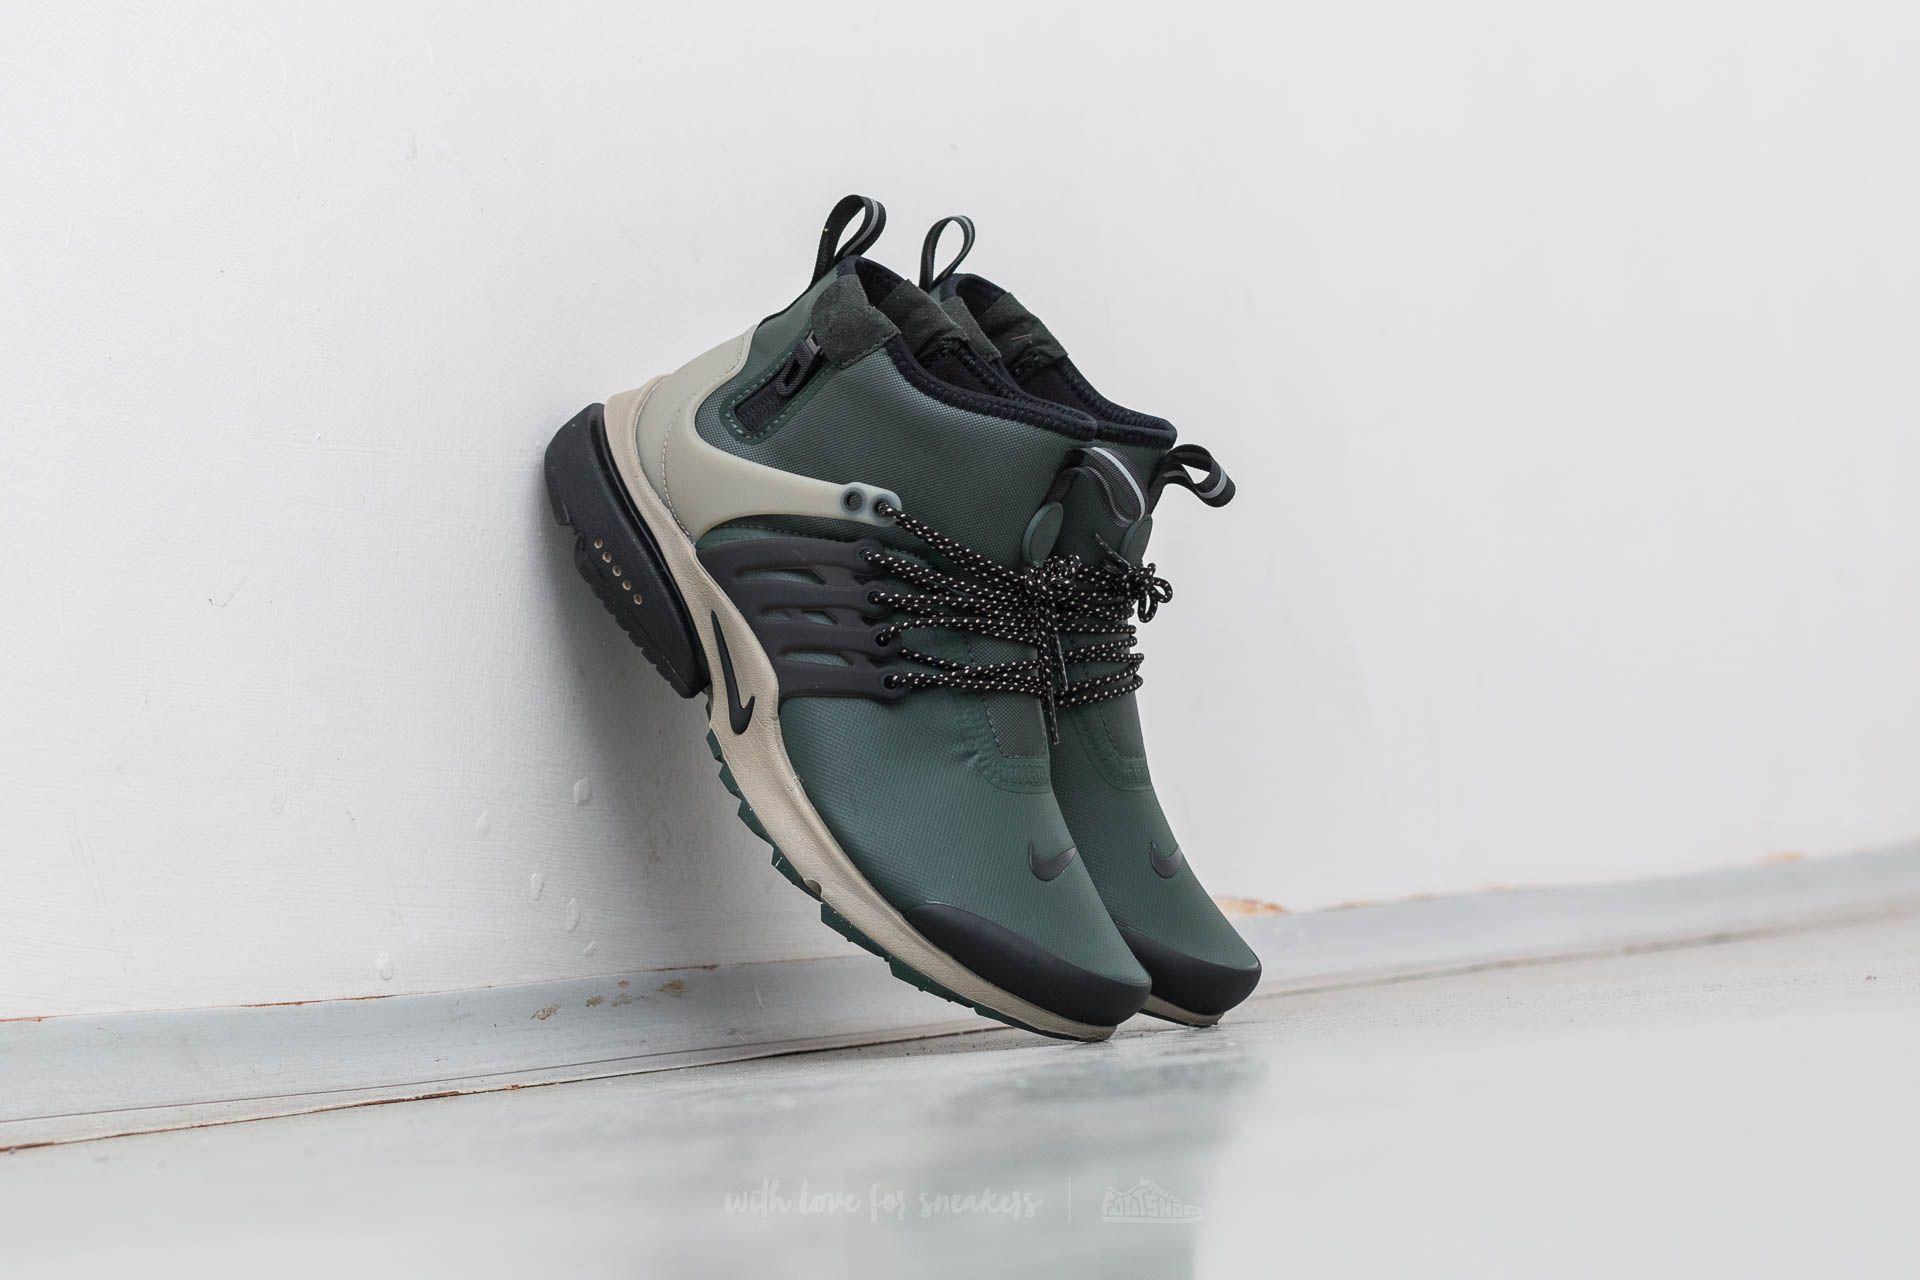 7fe17139a0b3 Nike Air Presto Mid Utility Grove Green  Black-Khaki